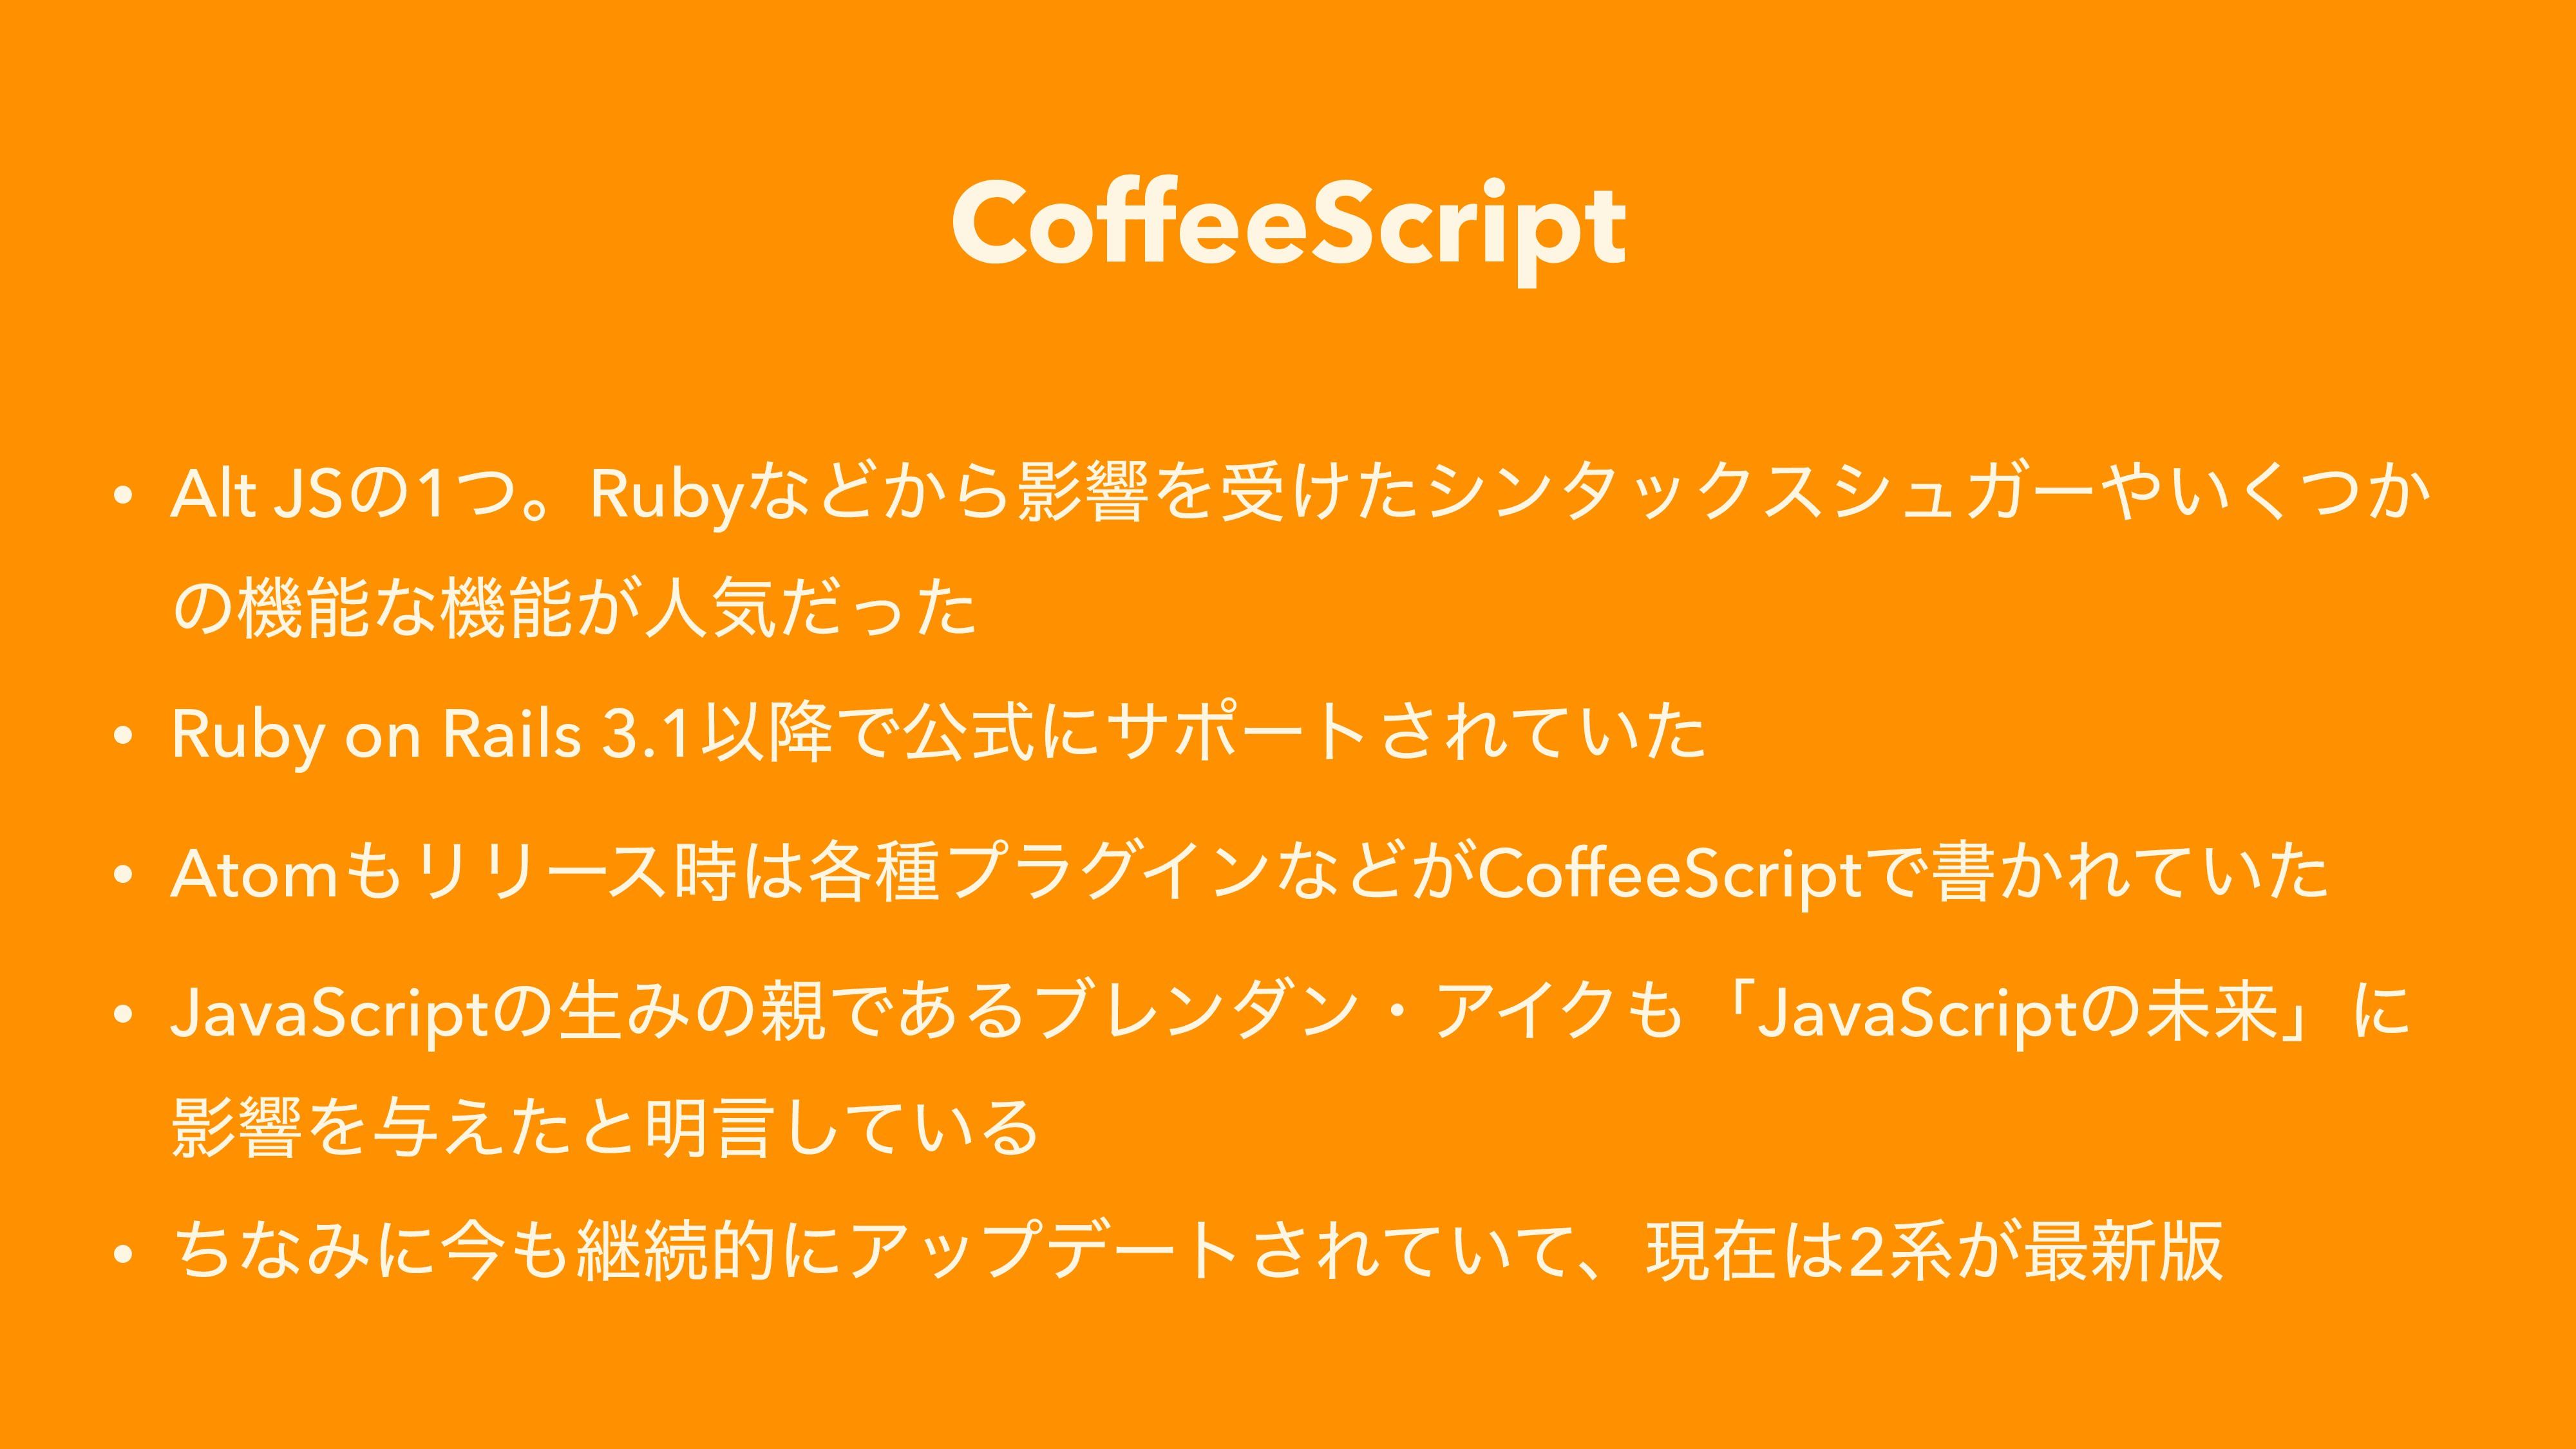 CoffeeScript • Alt JSͷ1ͭɻRubyͳͲ͔ΒӨڹΛड͚ͨγϯλοΫεγϡ...